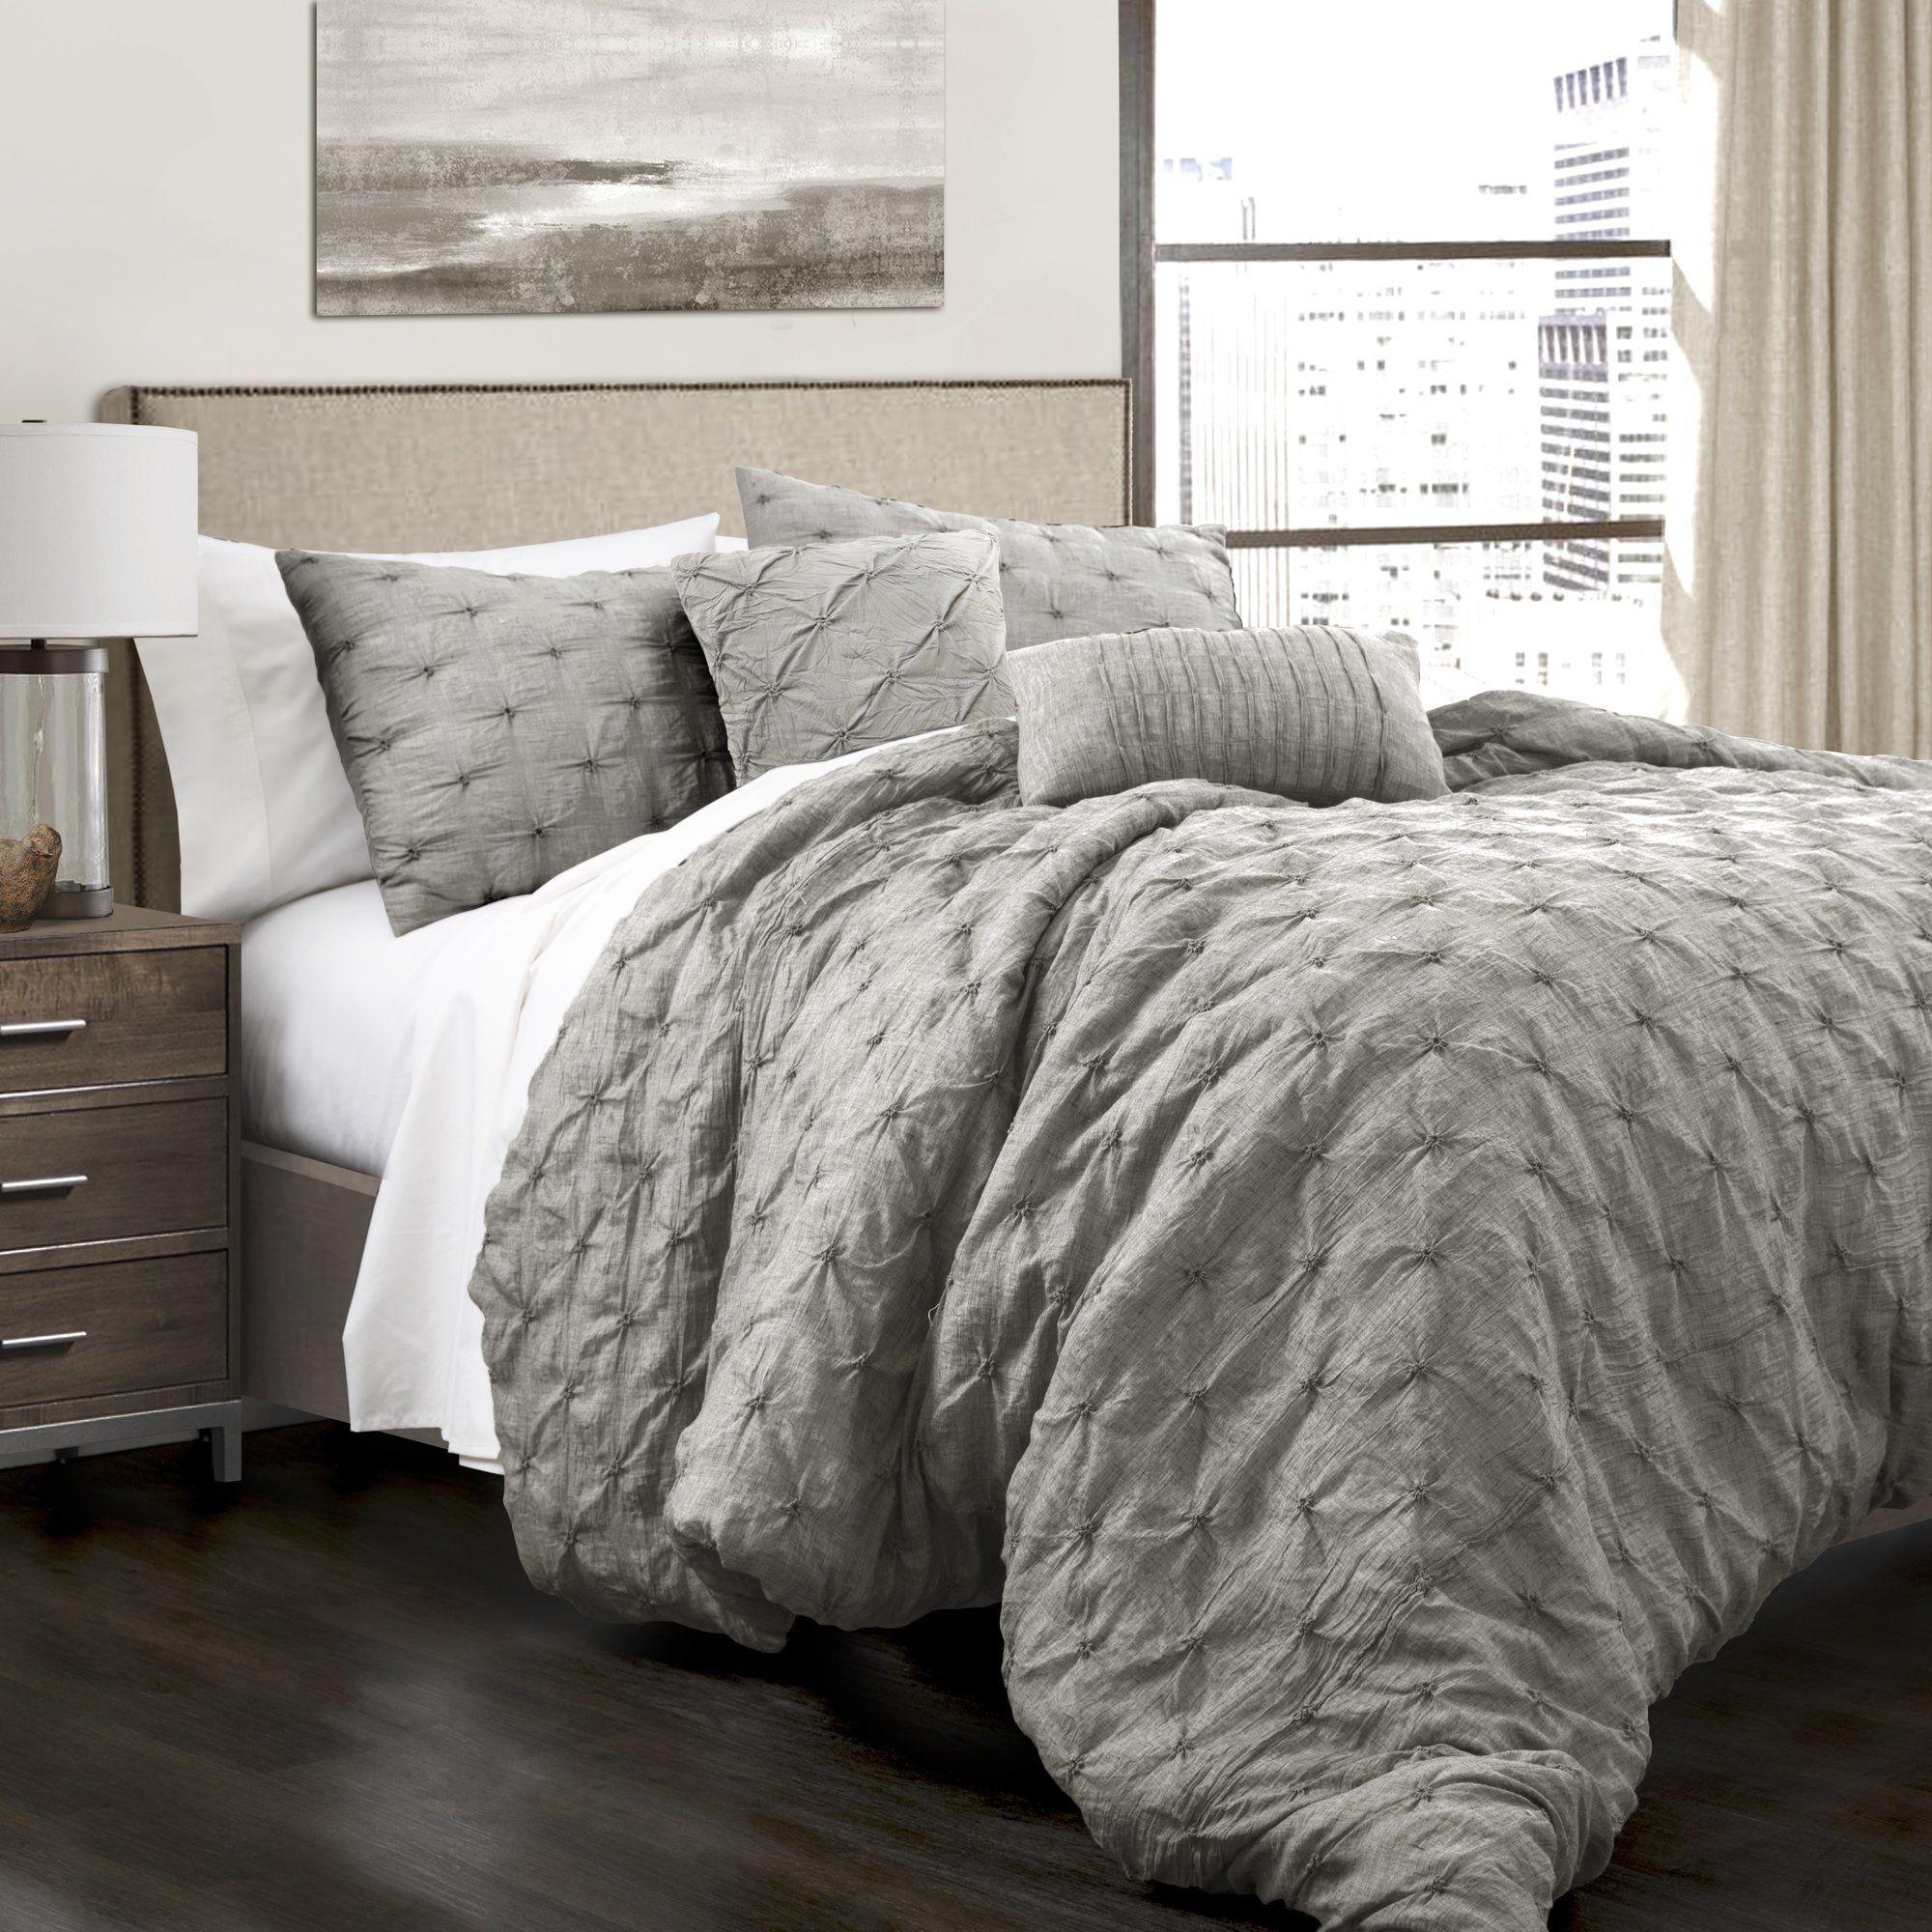 Customer Image Zoomed 134 All Modern Comforter Sets King Comforter Sets Pintuck Comforter